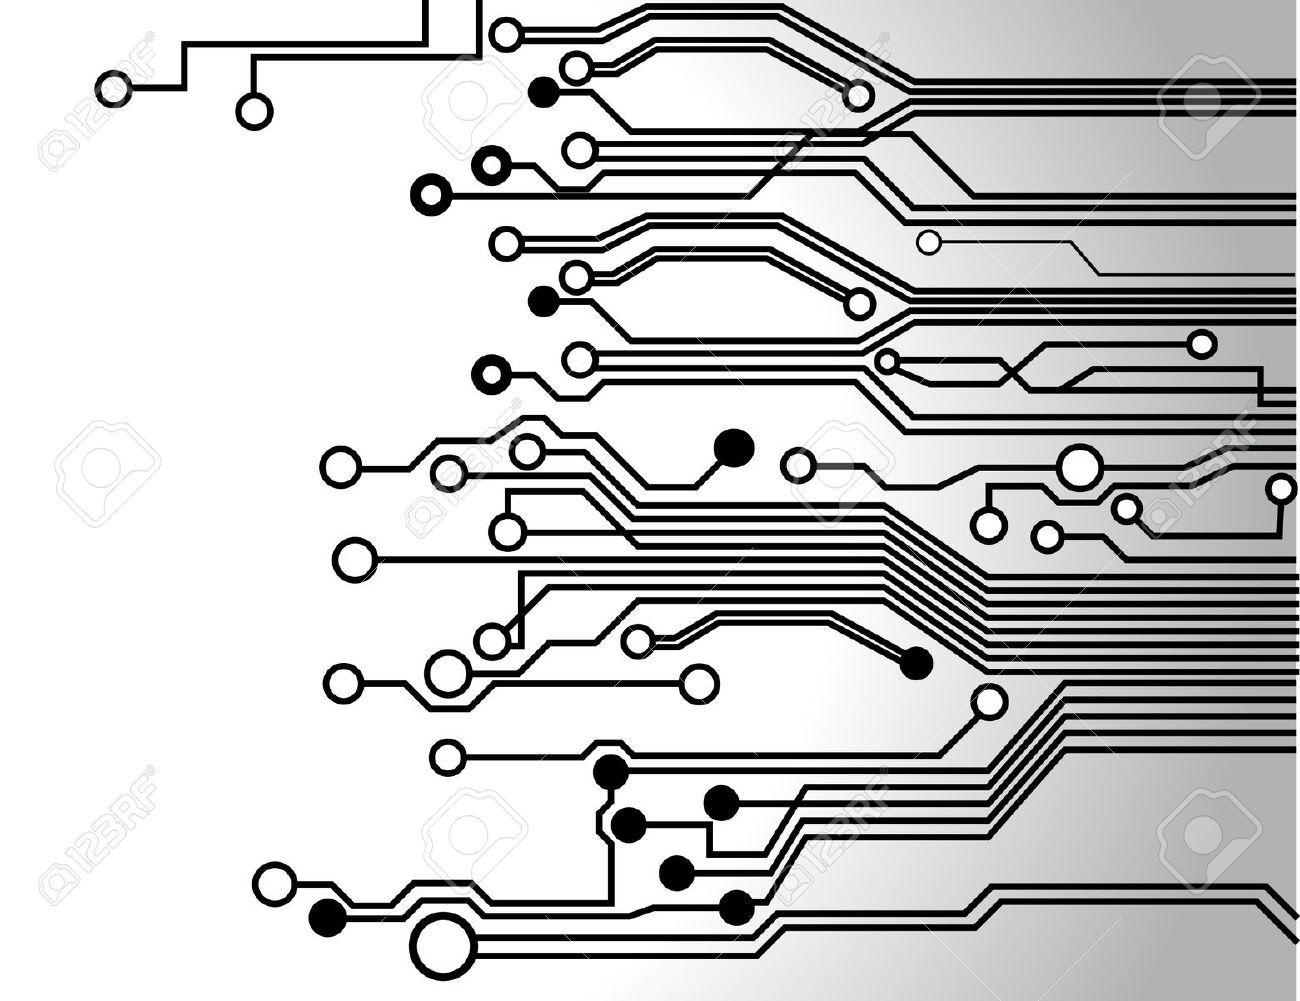 Tree Design On Circuit Board Wallpaper Vector Image: White Board Texture - Google Search